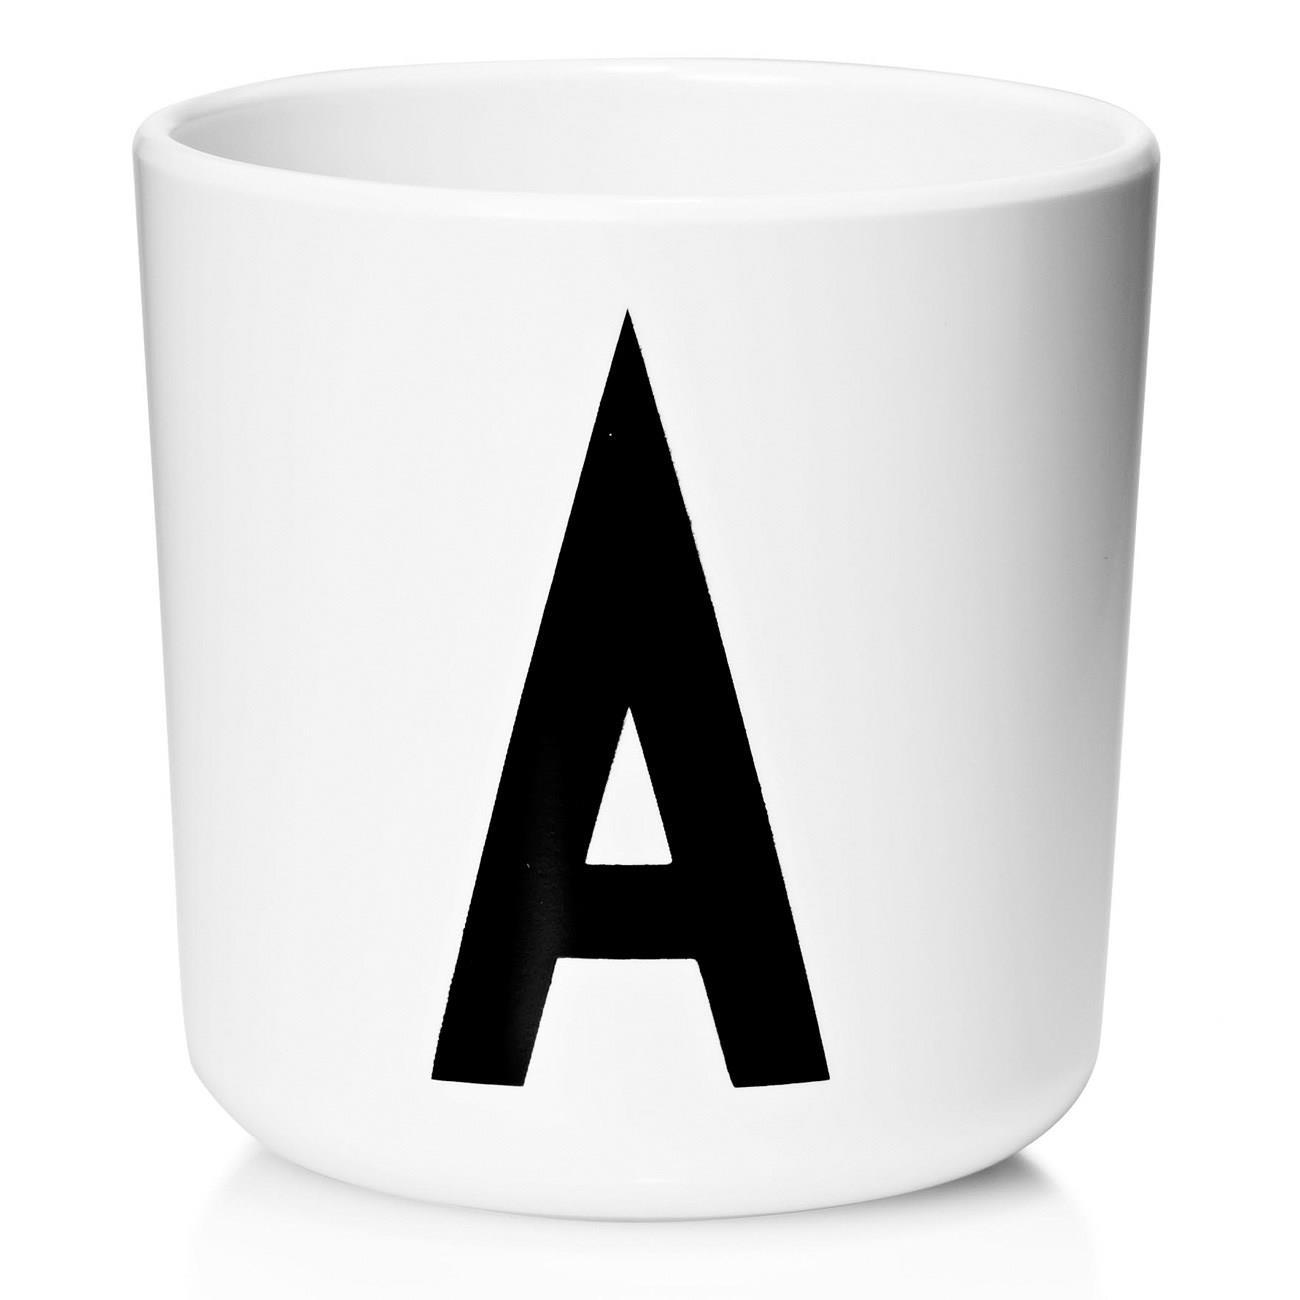 design letters kop Design Letters ABC Kop Hvid design letters kop